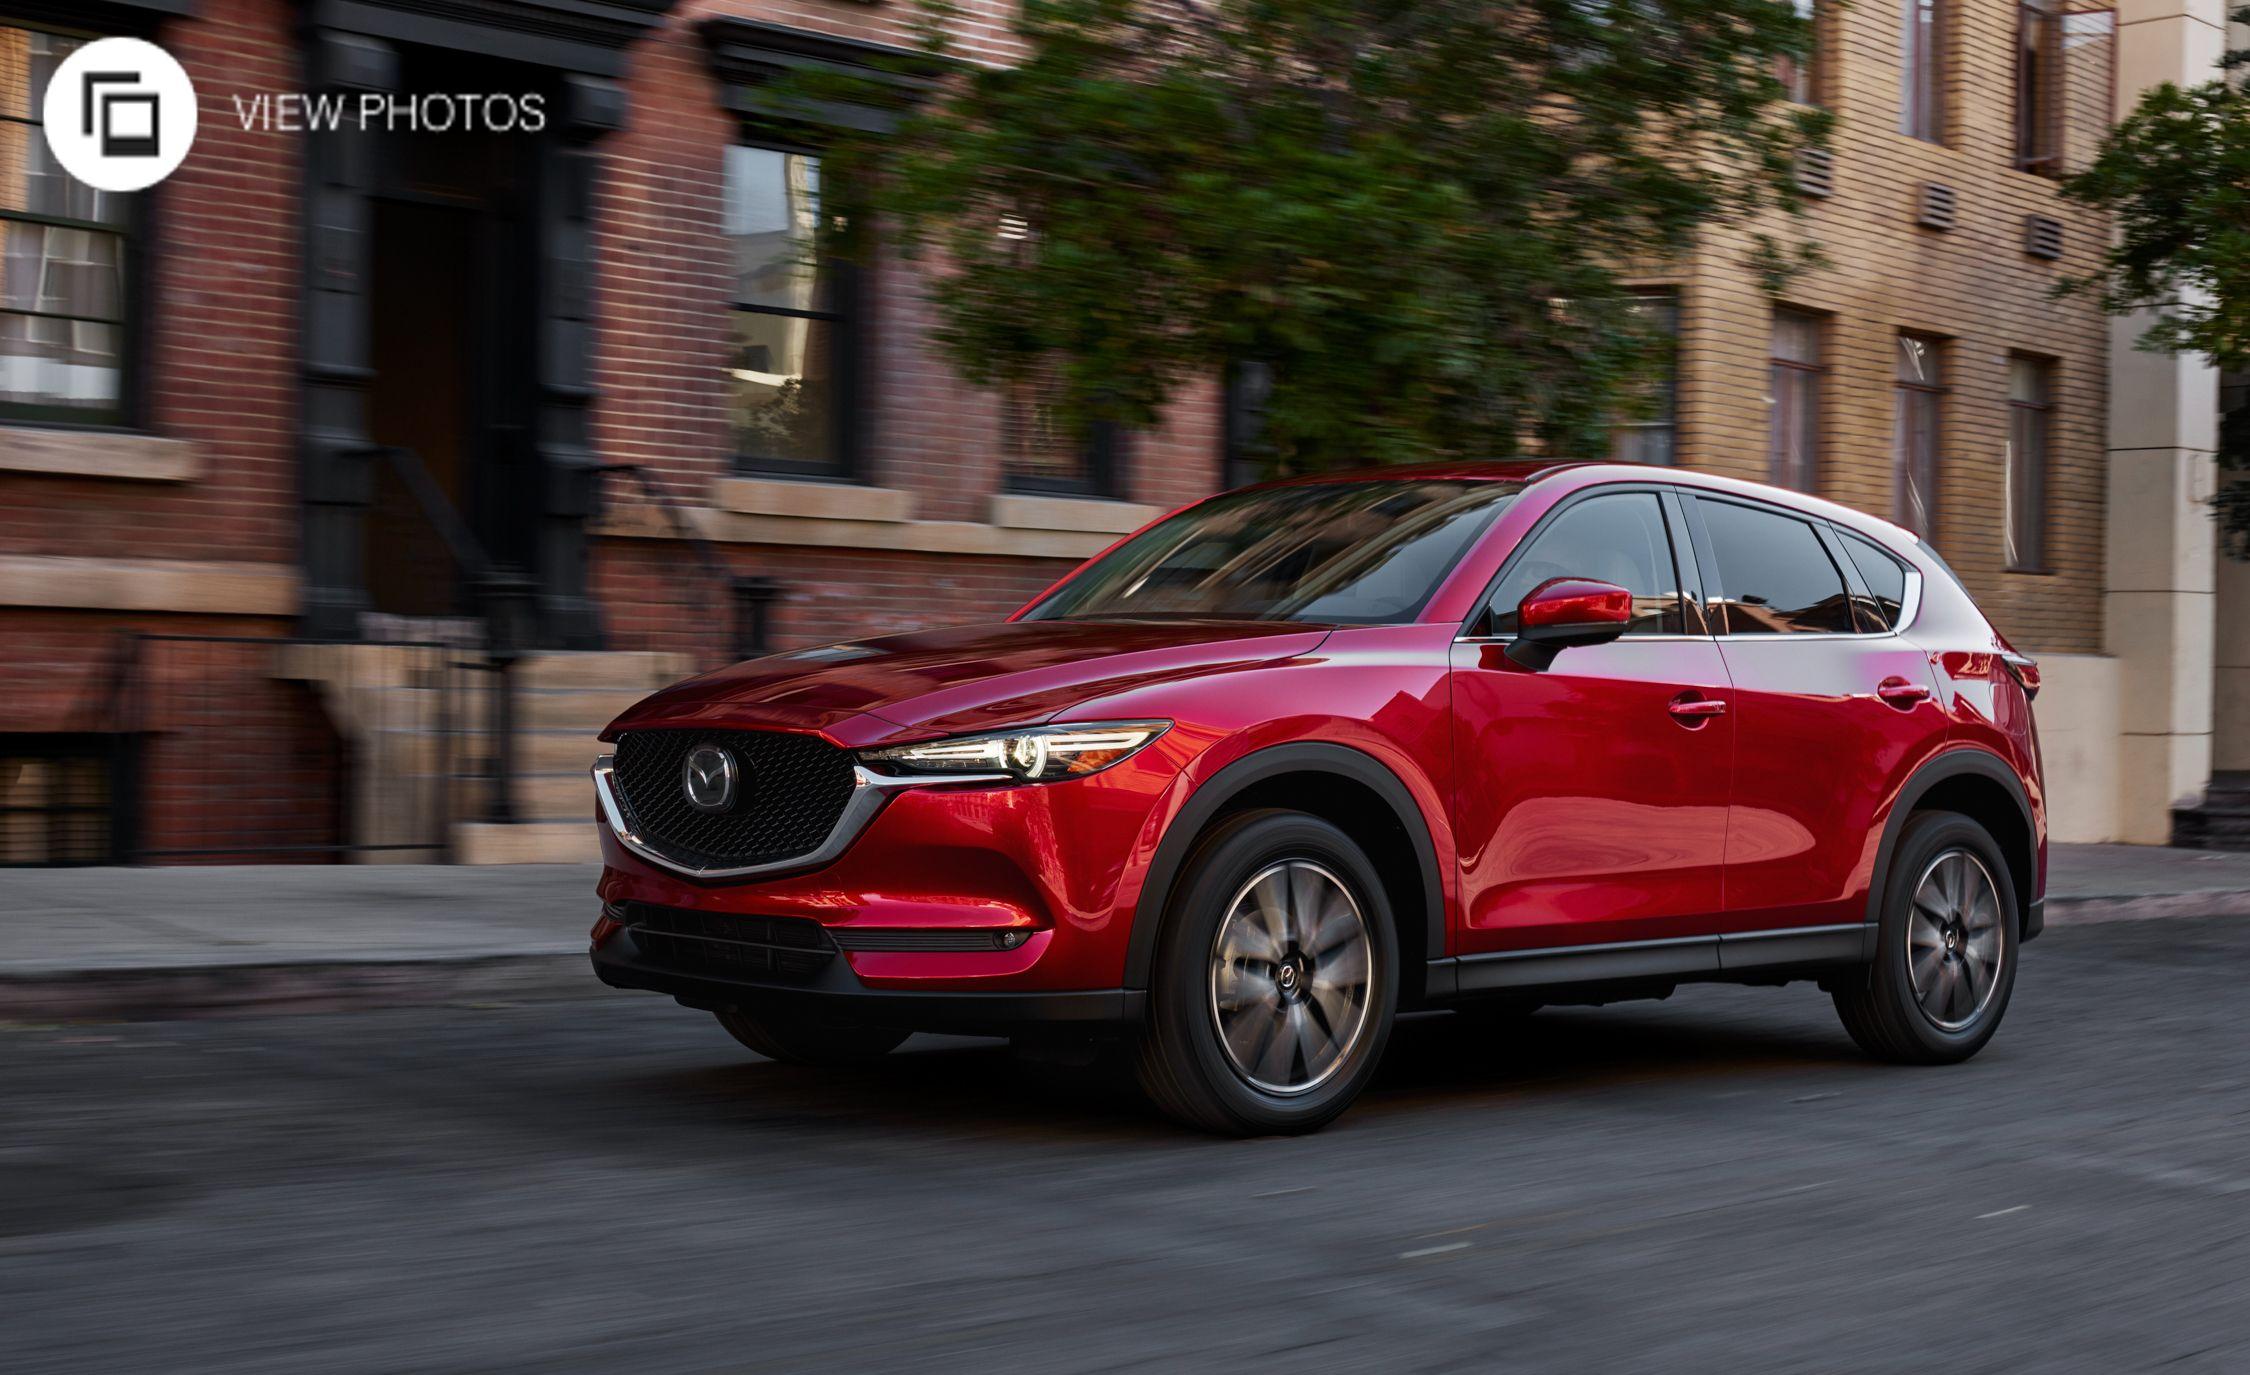 2018 Mazda Cx 5 Diesel Fuel Economy Isn T That Great